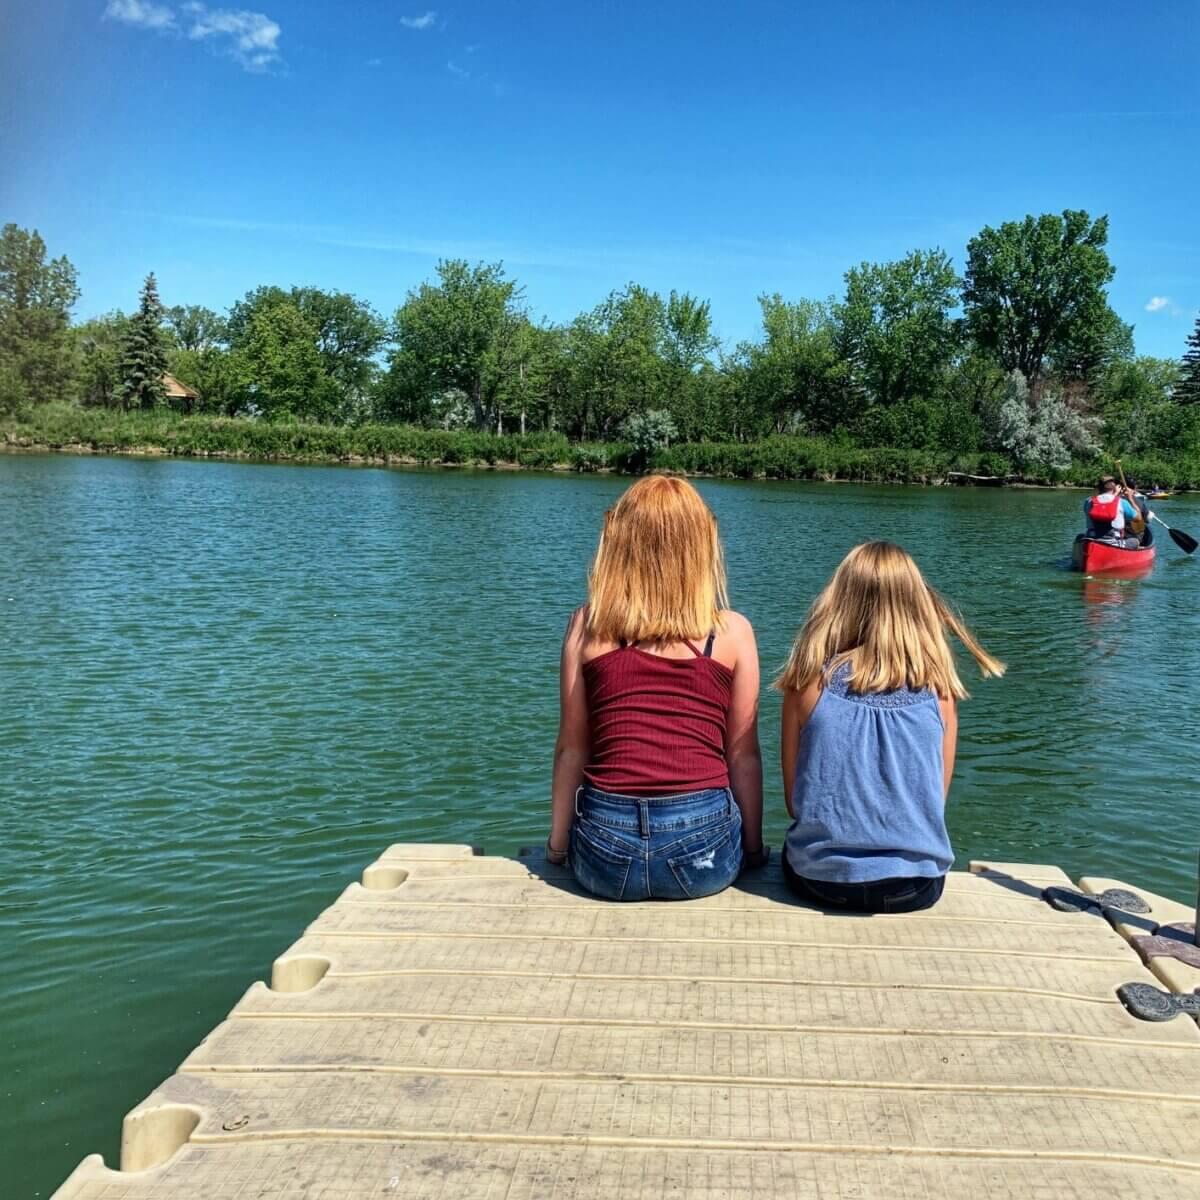 2 girls sitting on a dock